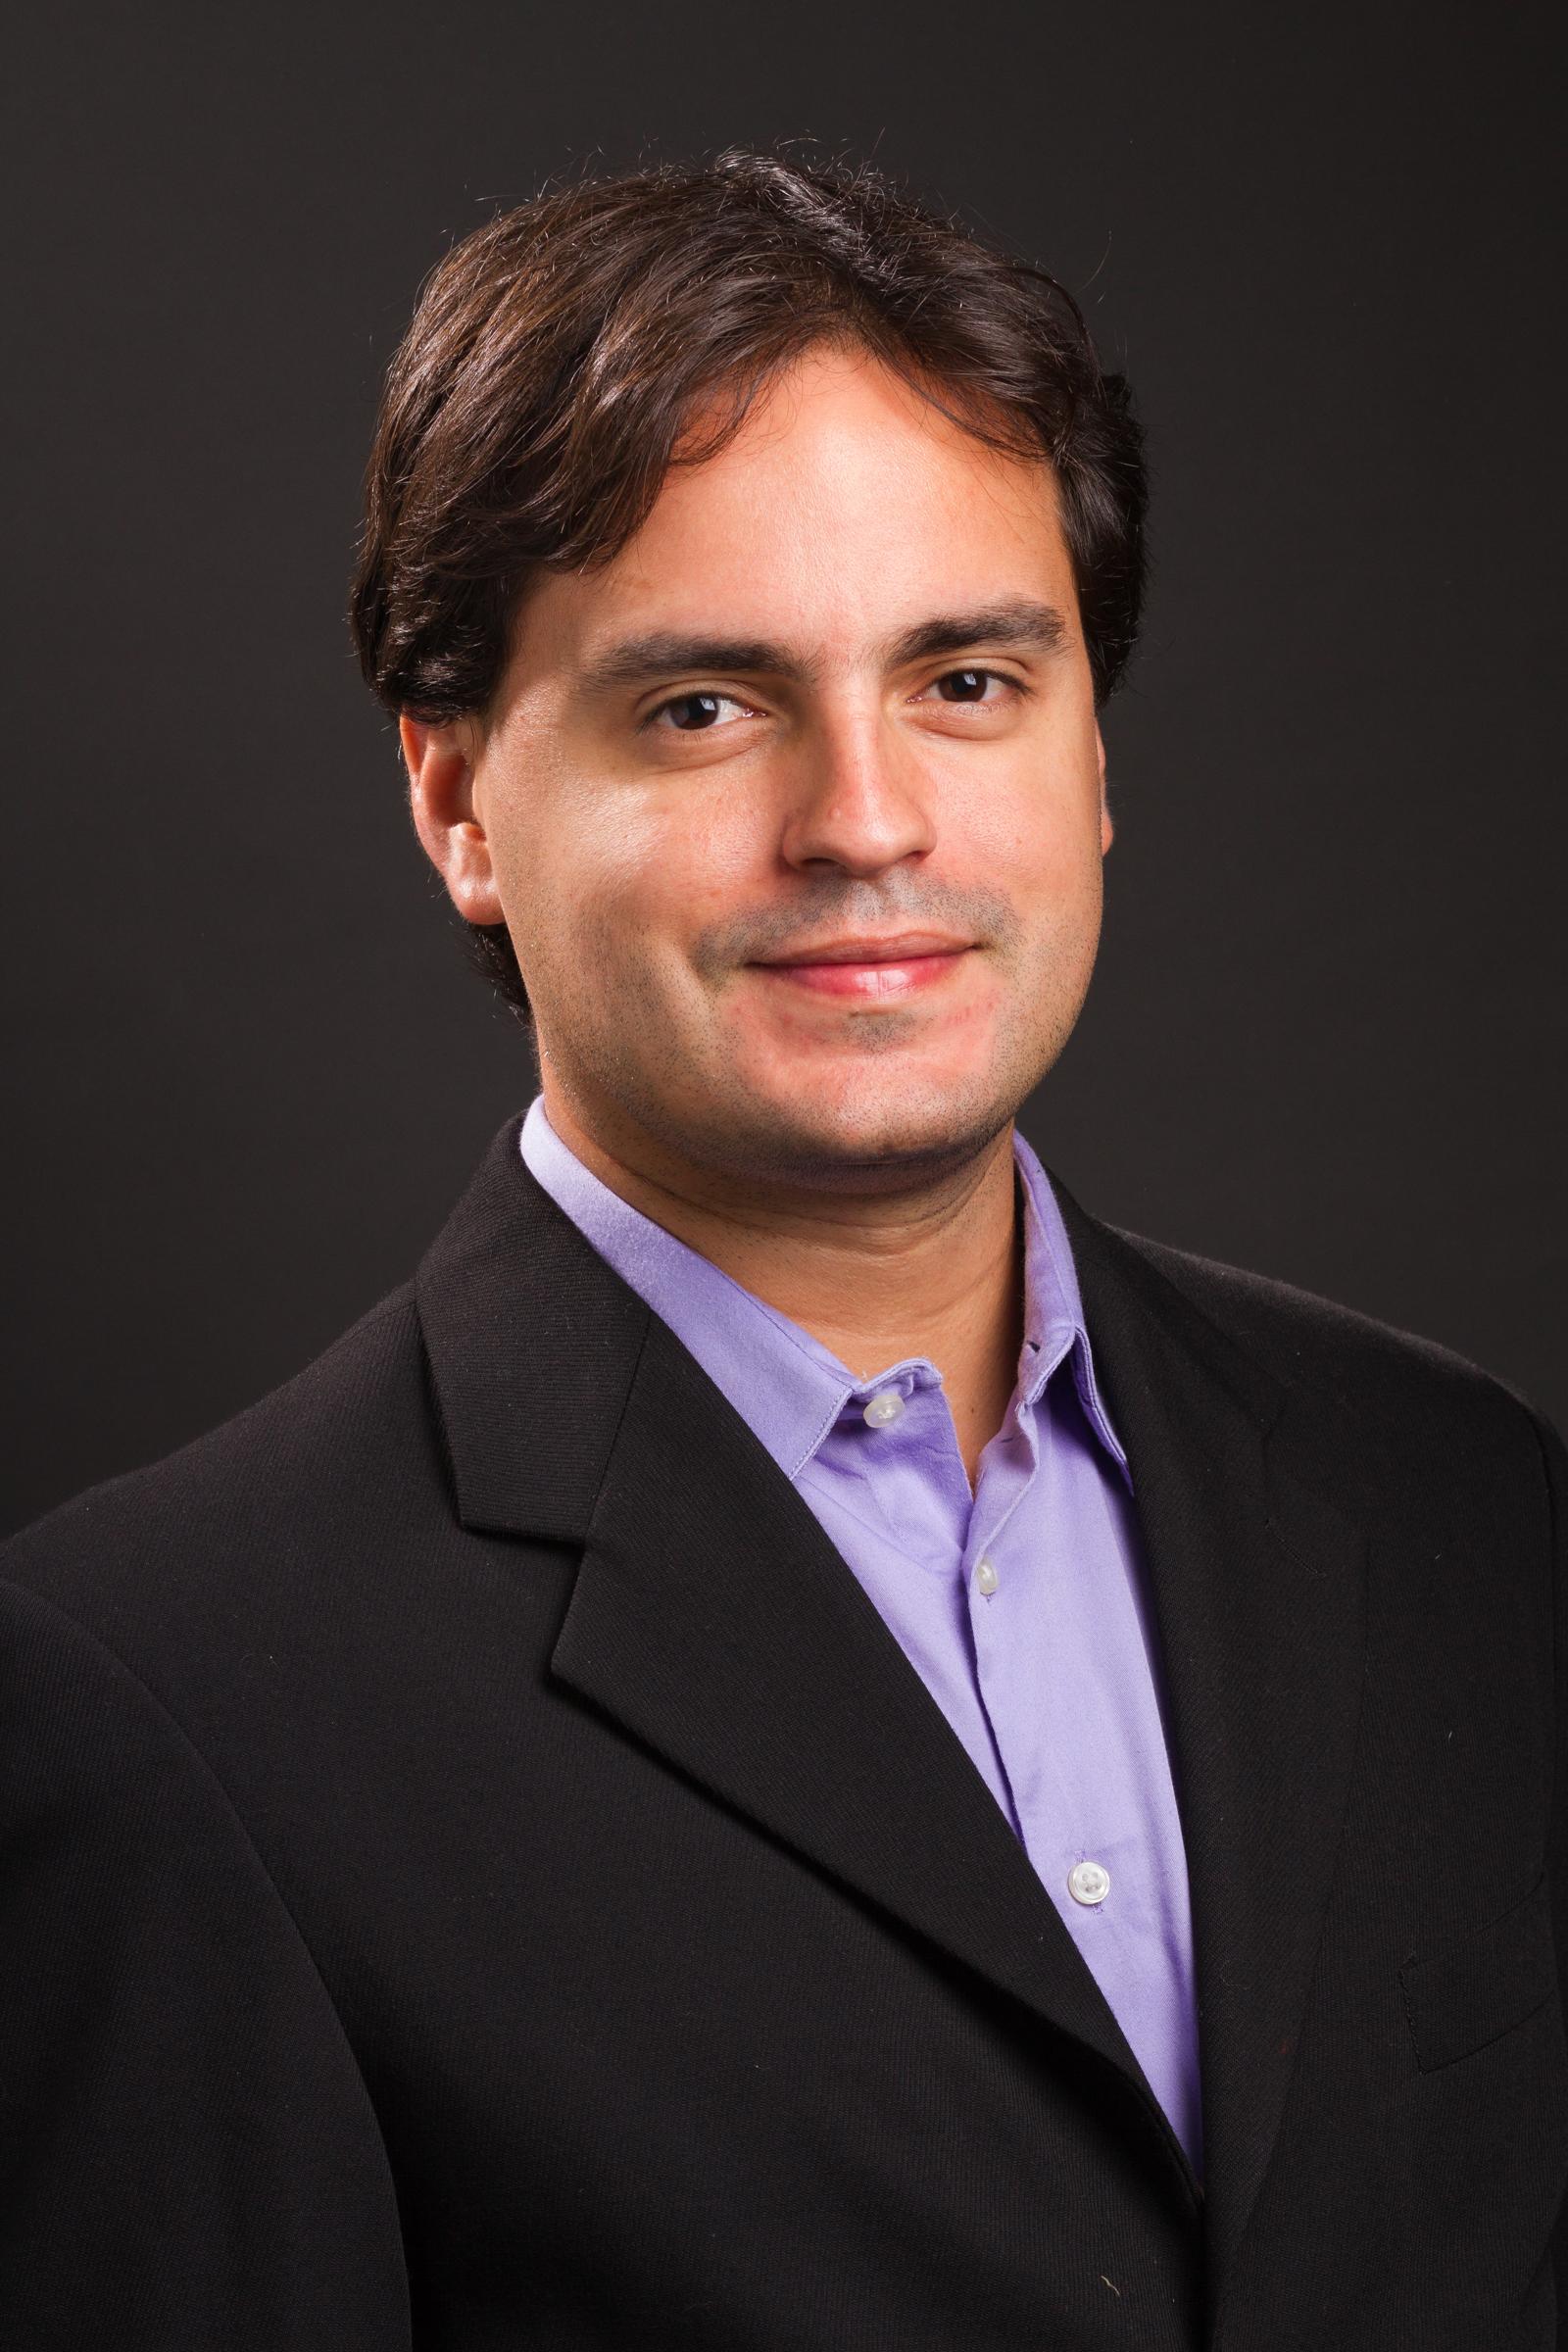 Daniel Colon-Ramos